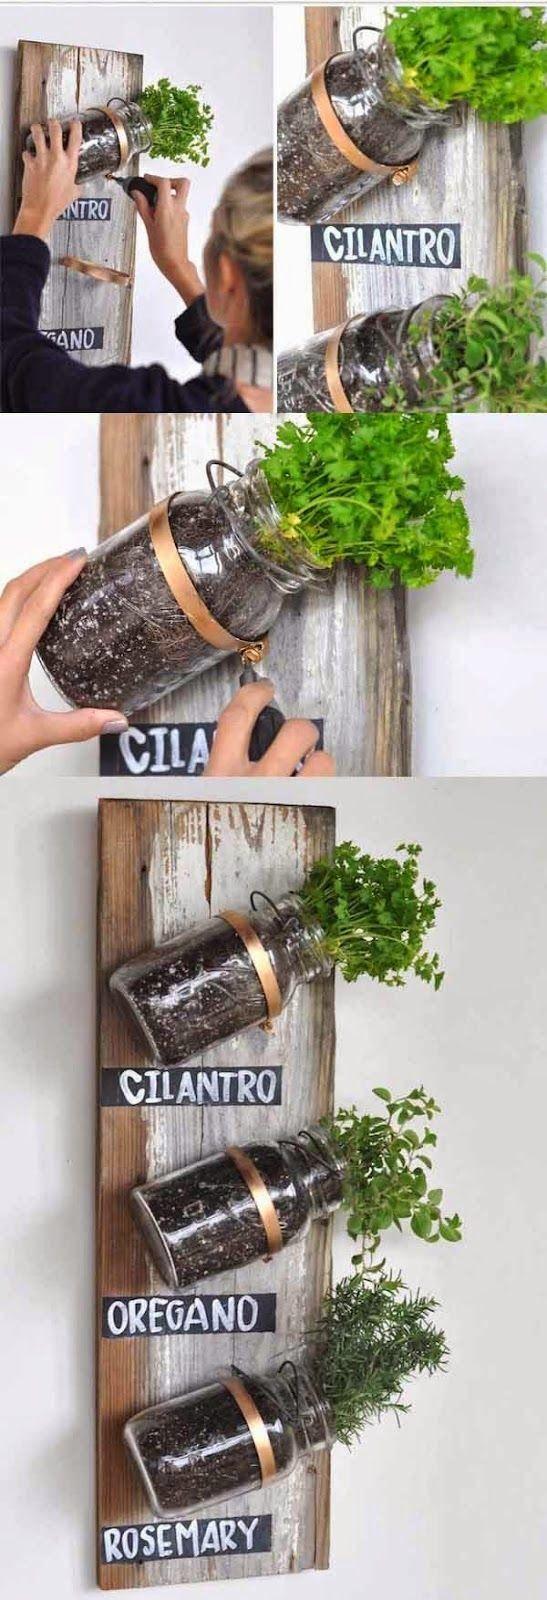 mini jardim ervas aromaticasIdeias de mini vasos improvisados para